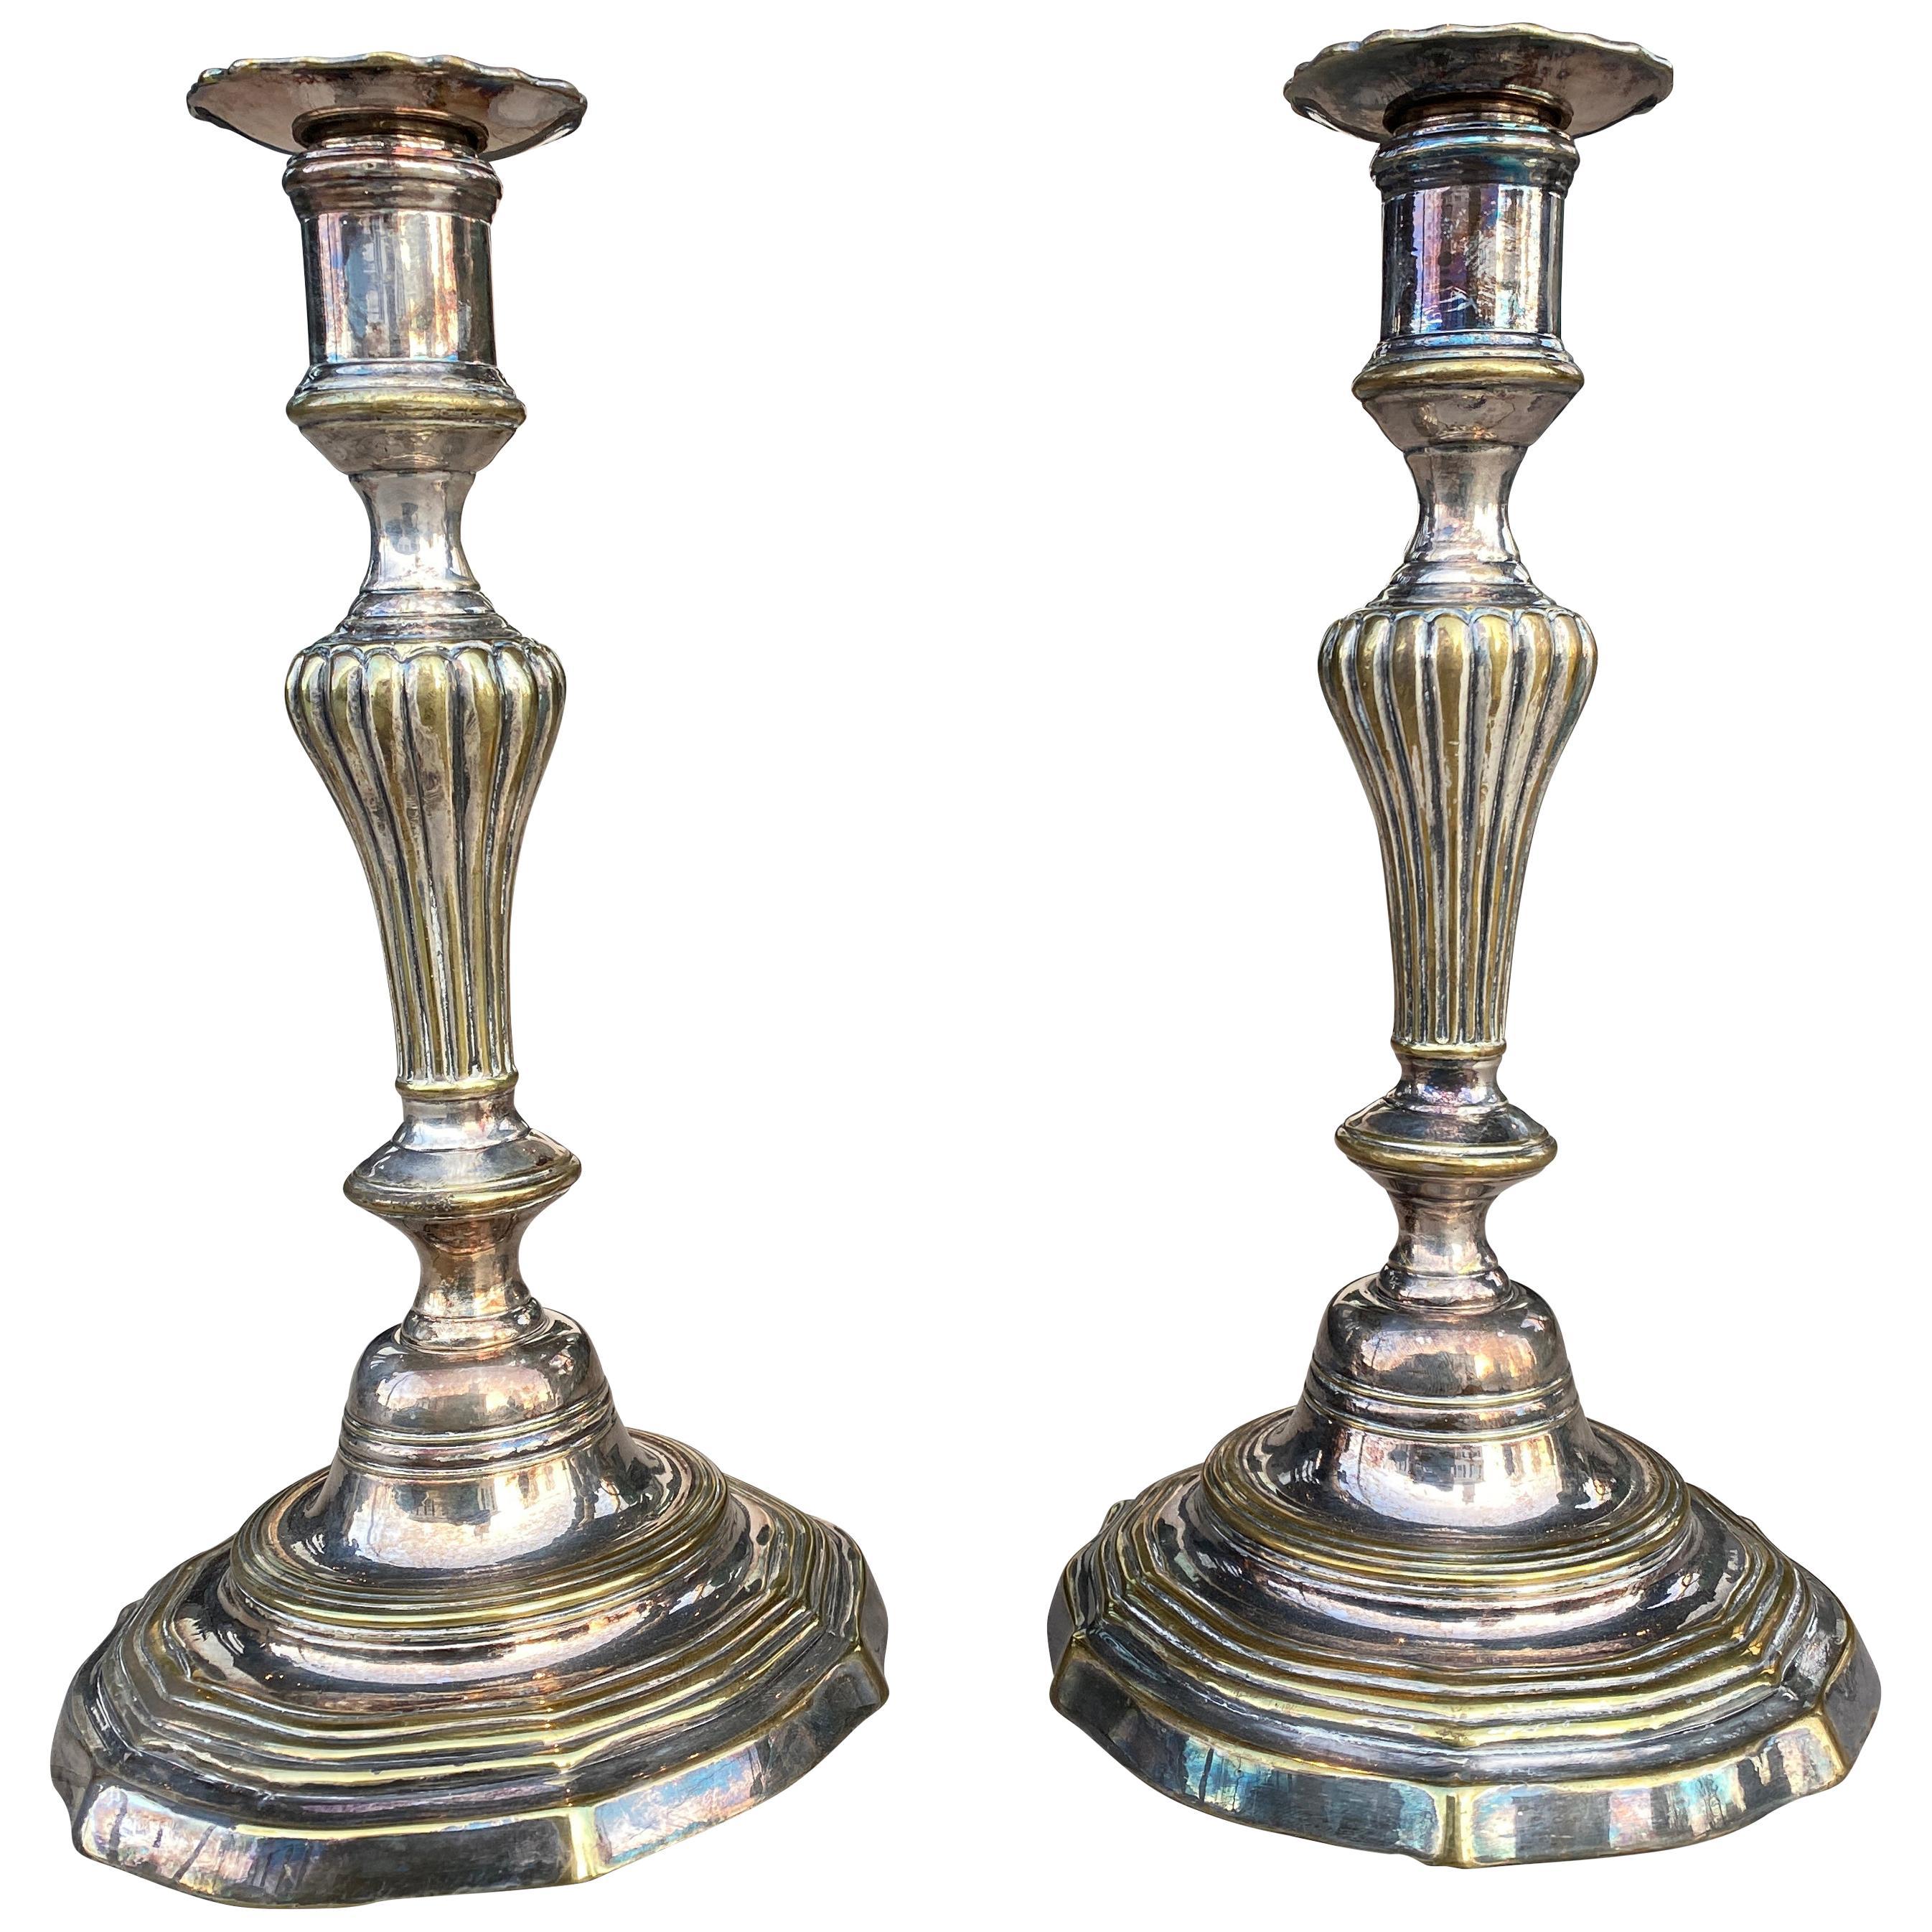 Pair of Louis XV Silvered Brass Candlesticks